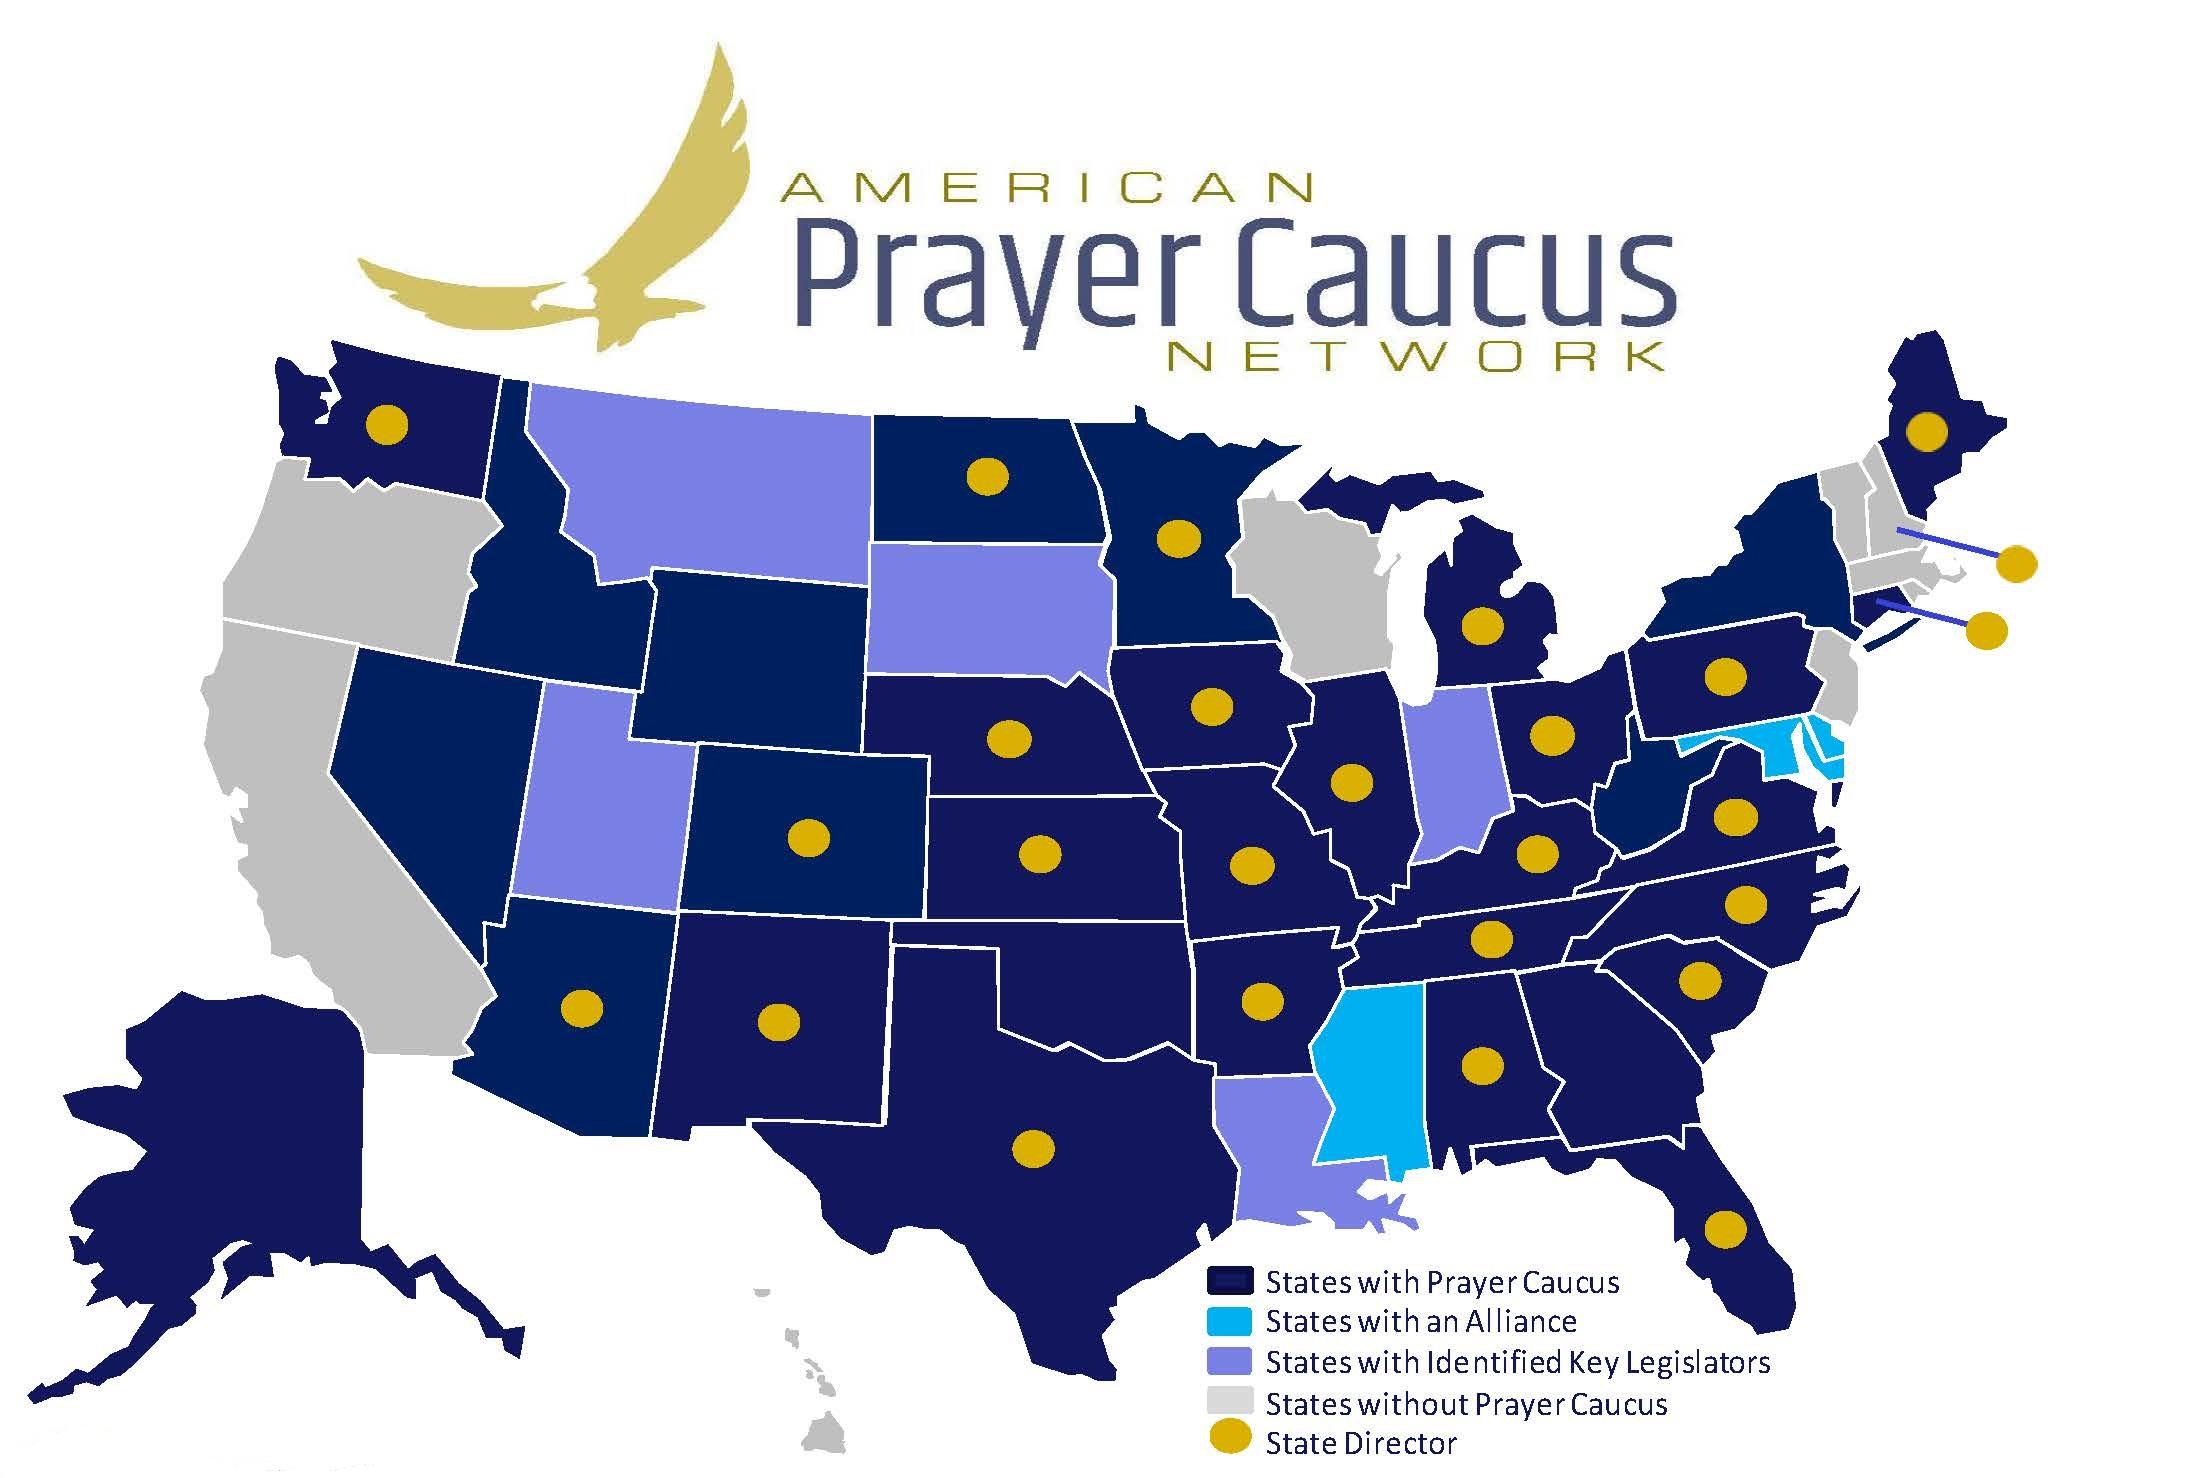 Congressional Prayer Caucus Foundation